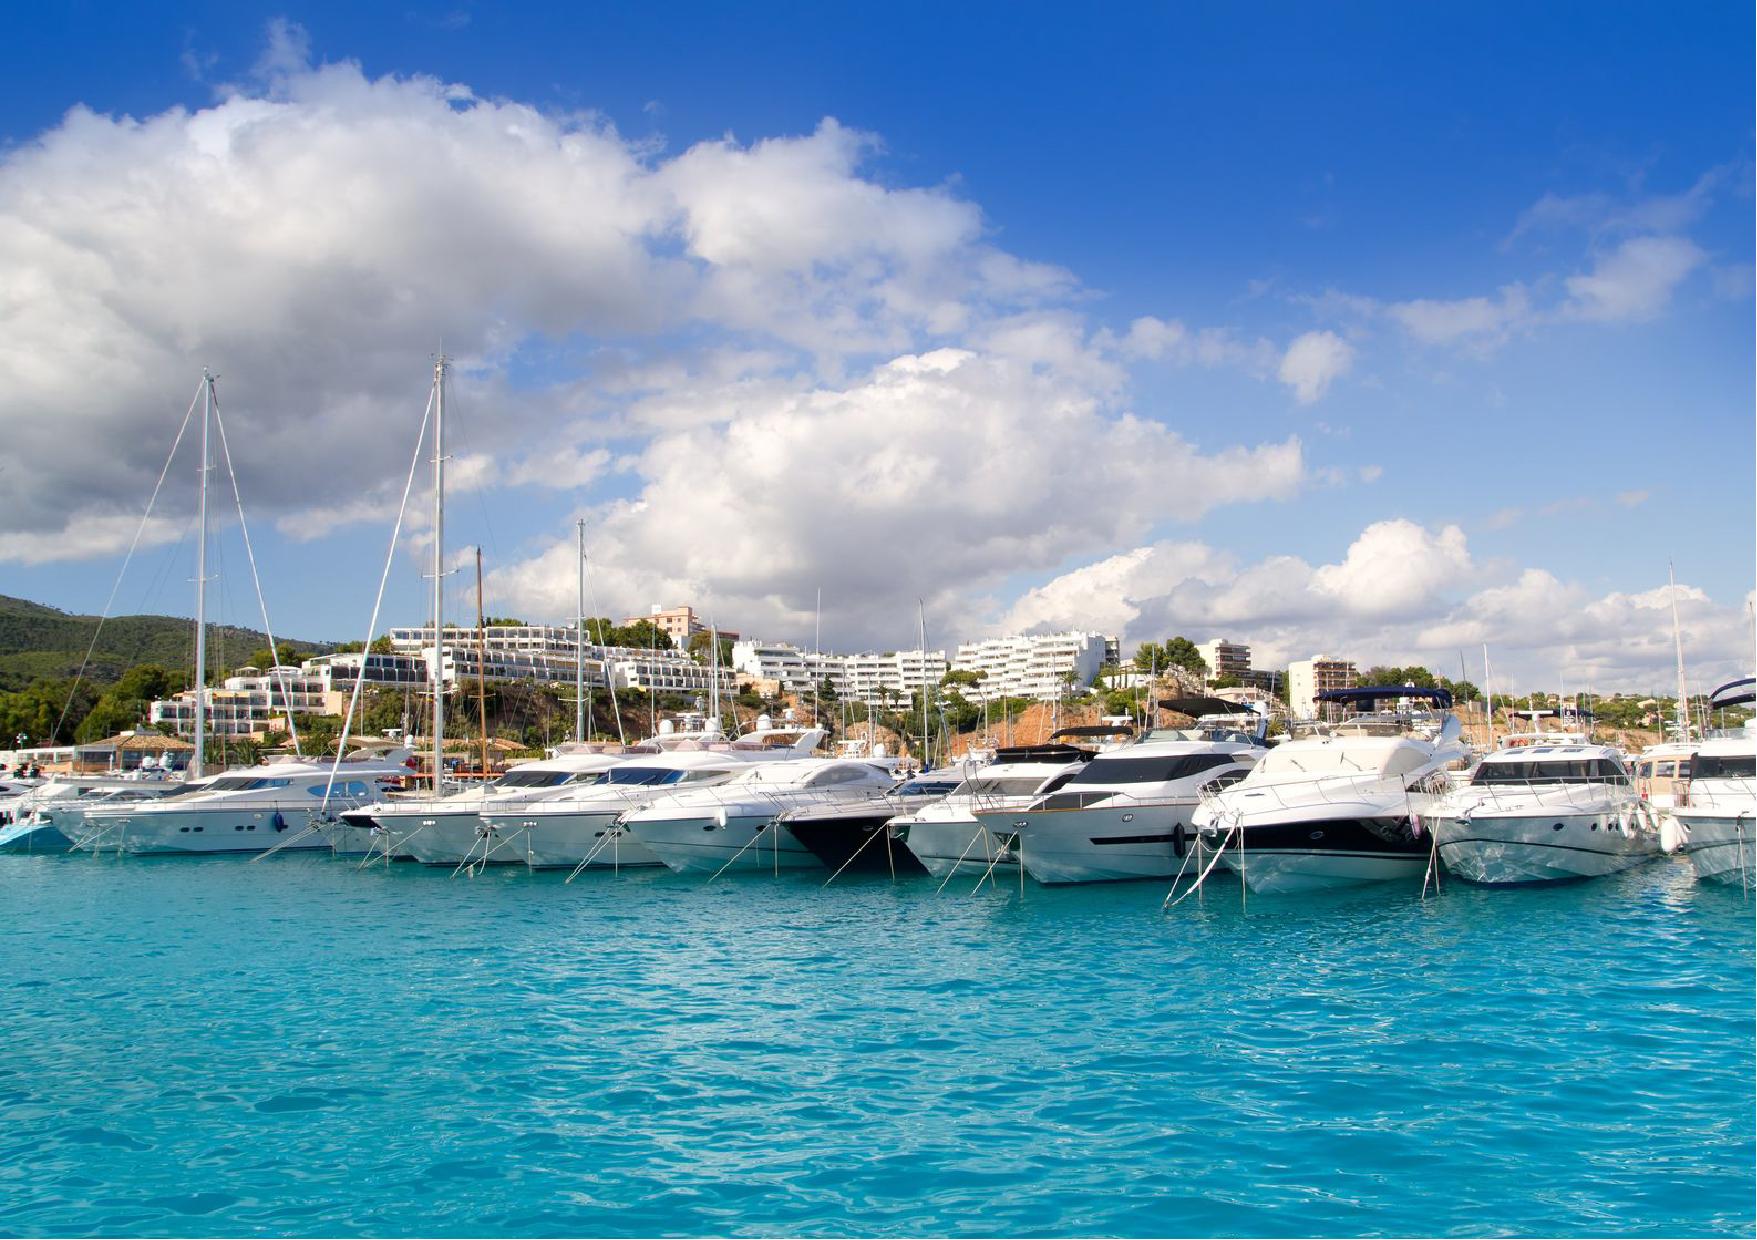 Excursions by boat 2019 from Santa Eulalia, Ibiza